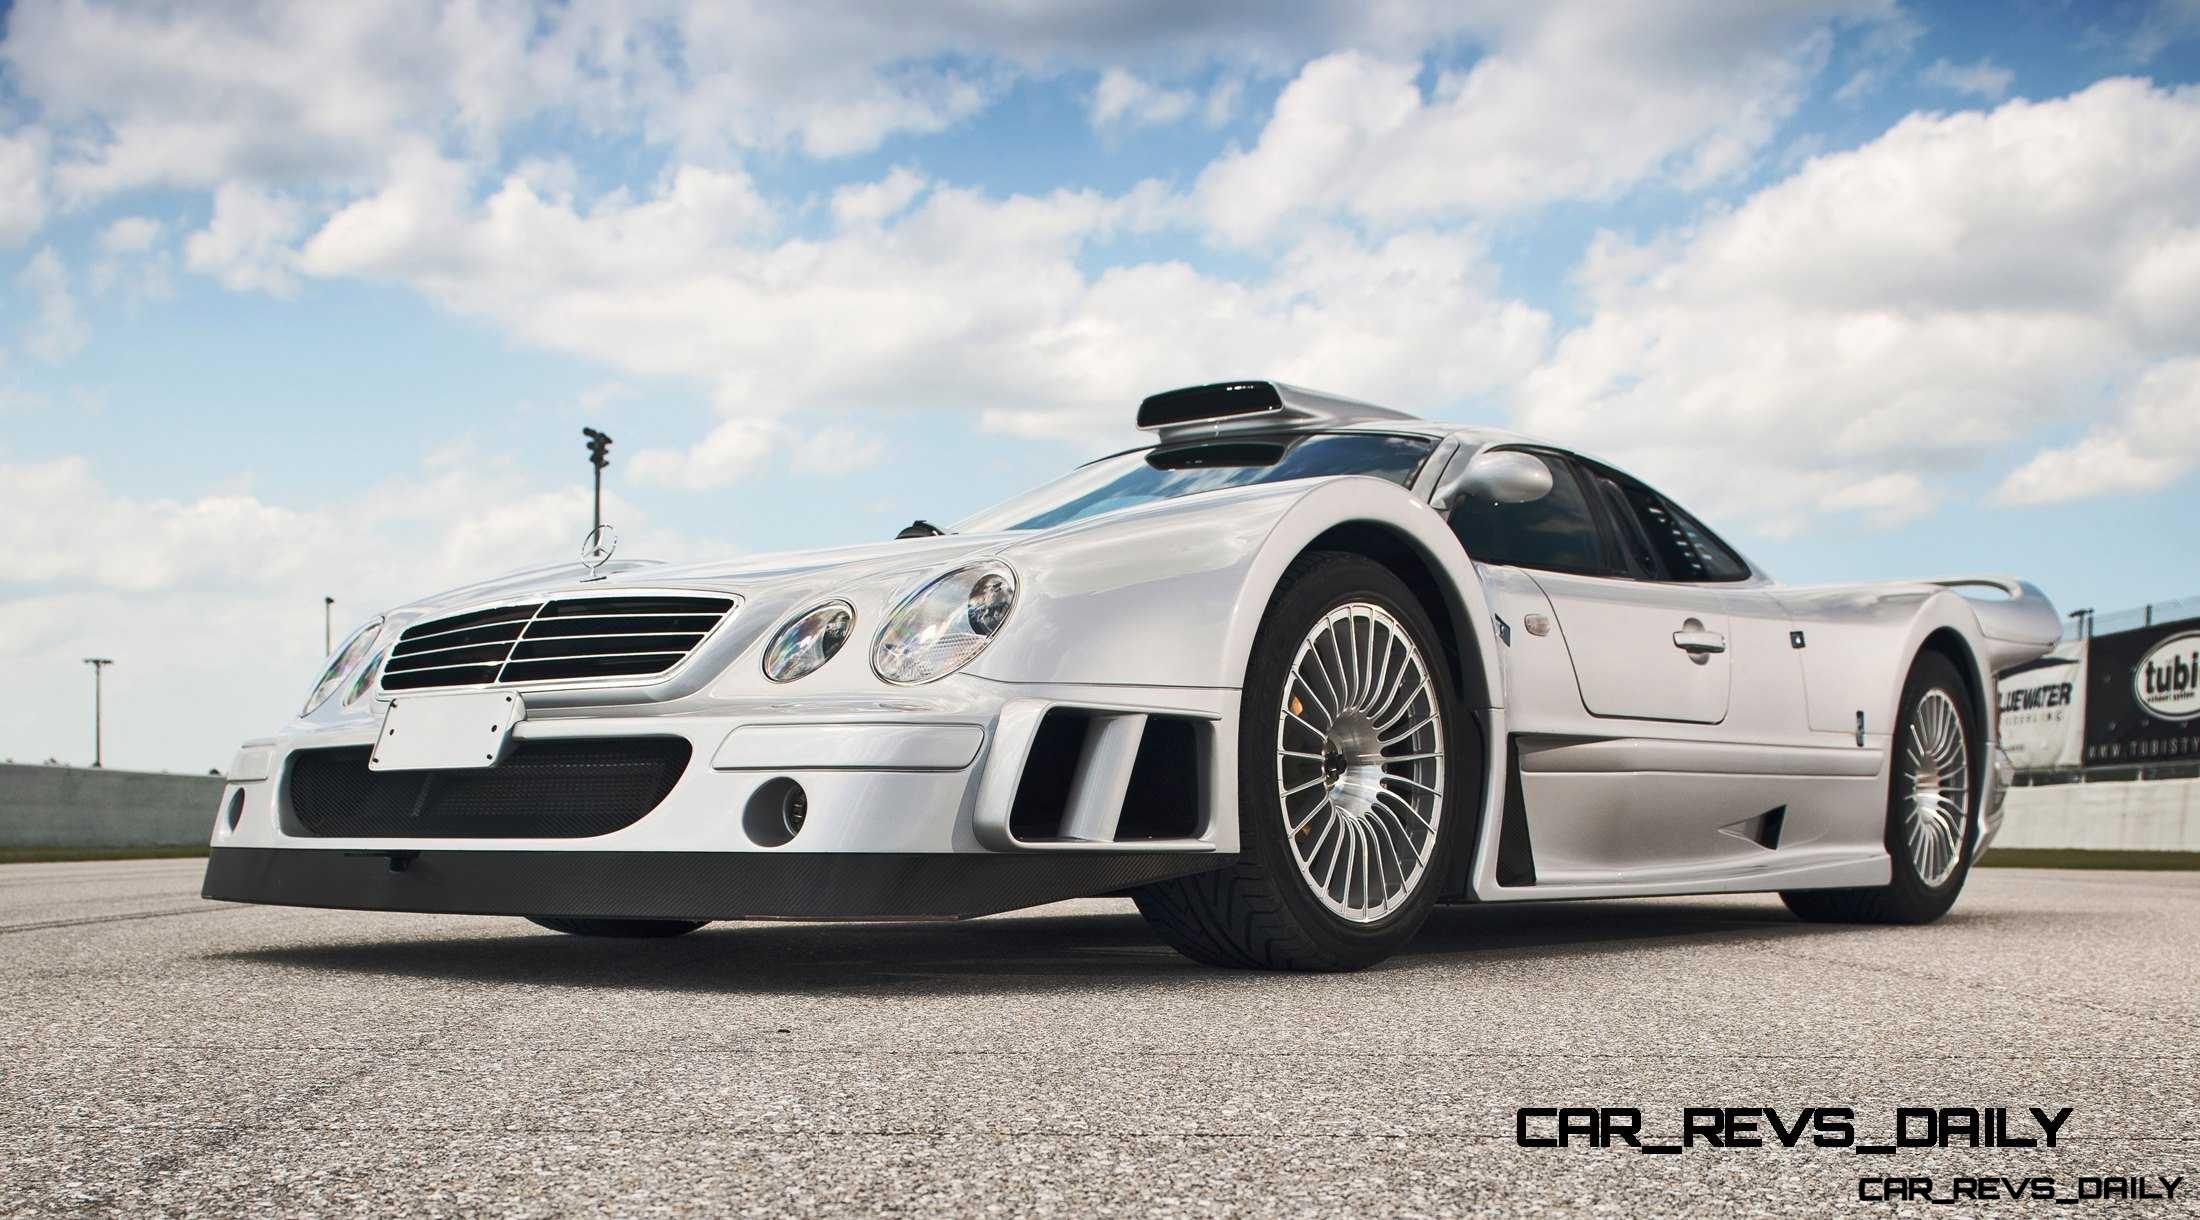 LeMans Homologation Specials - 1998 Mercedes-Benz CLK GTR SuperSport  30